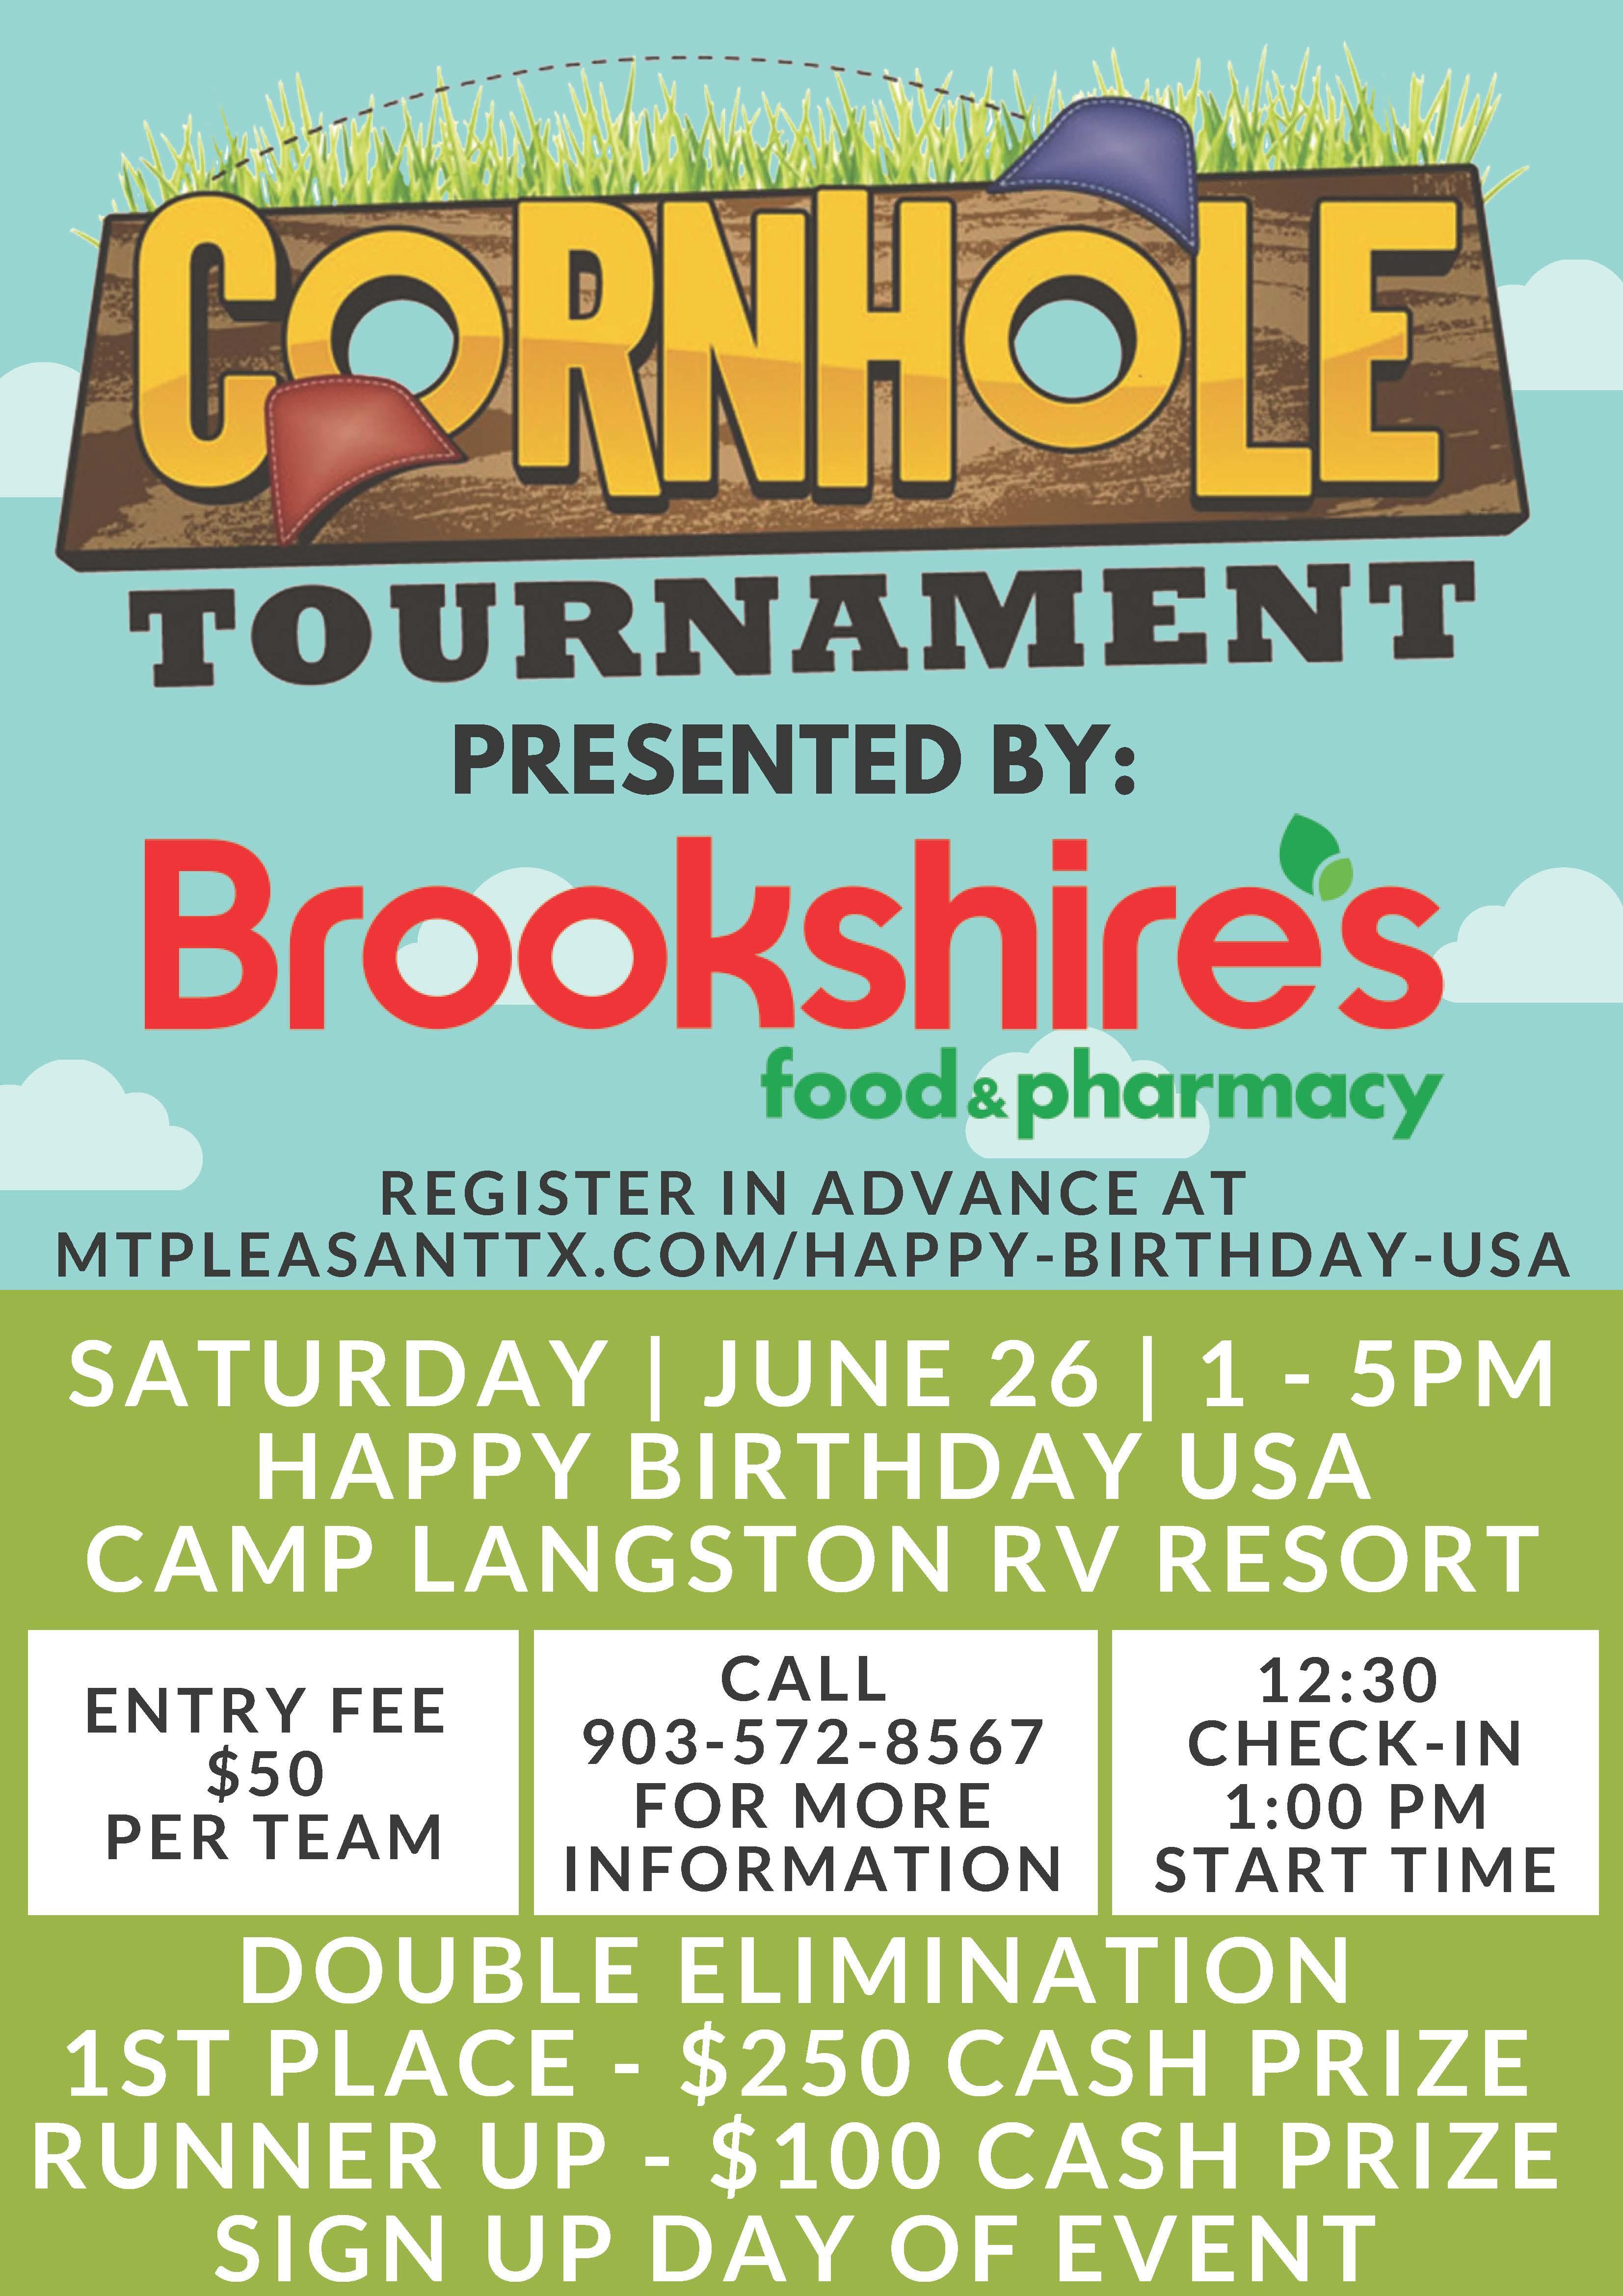 Brookeshire's Corn Hole Tournament Flyer